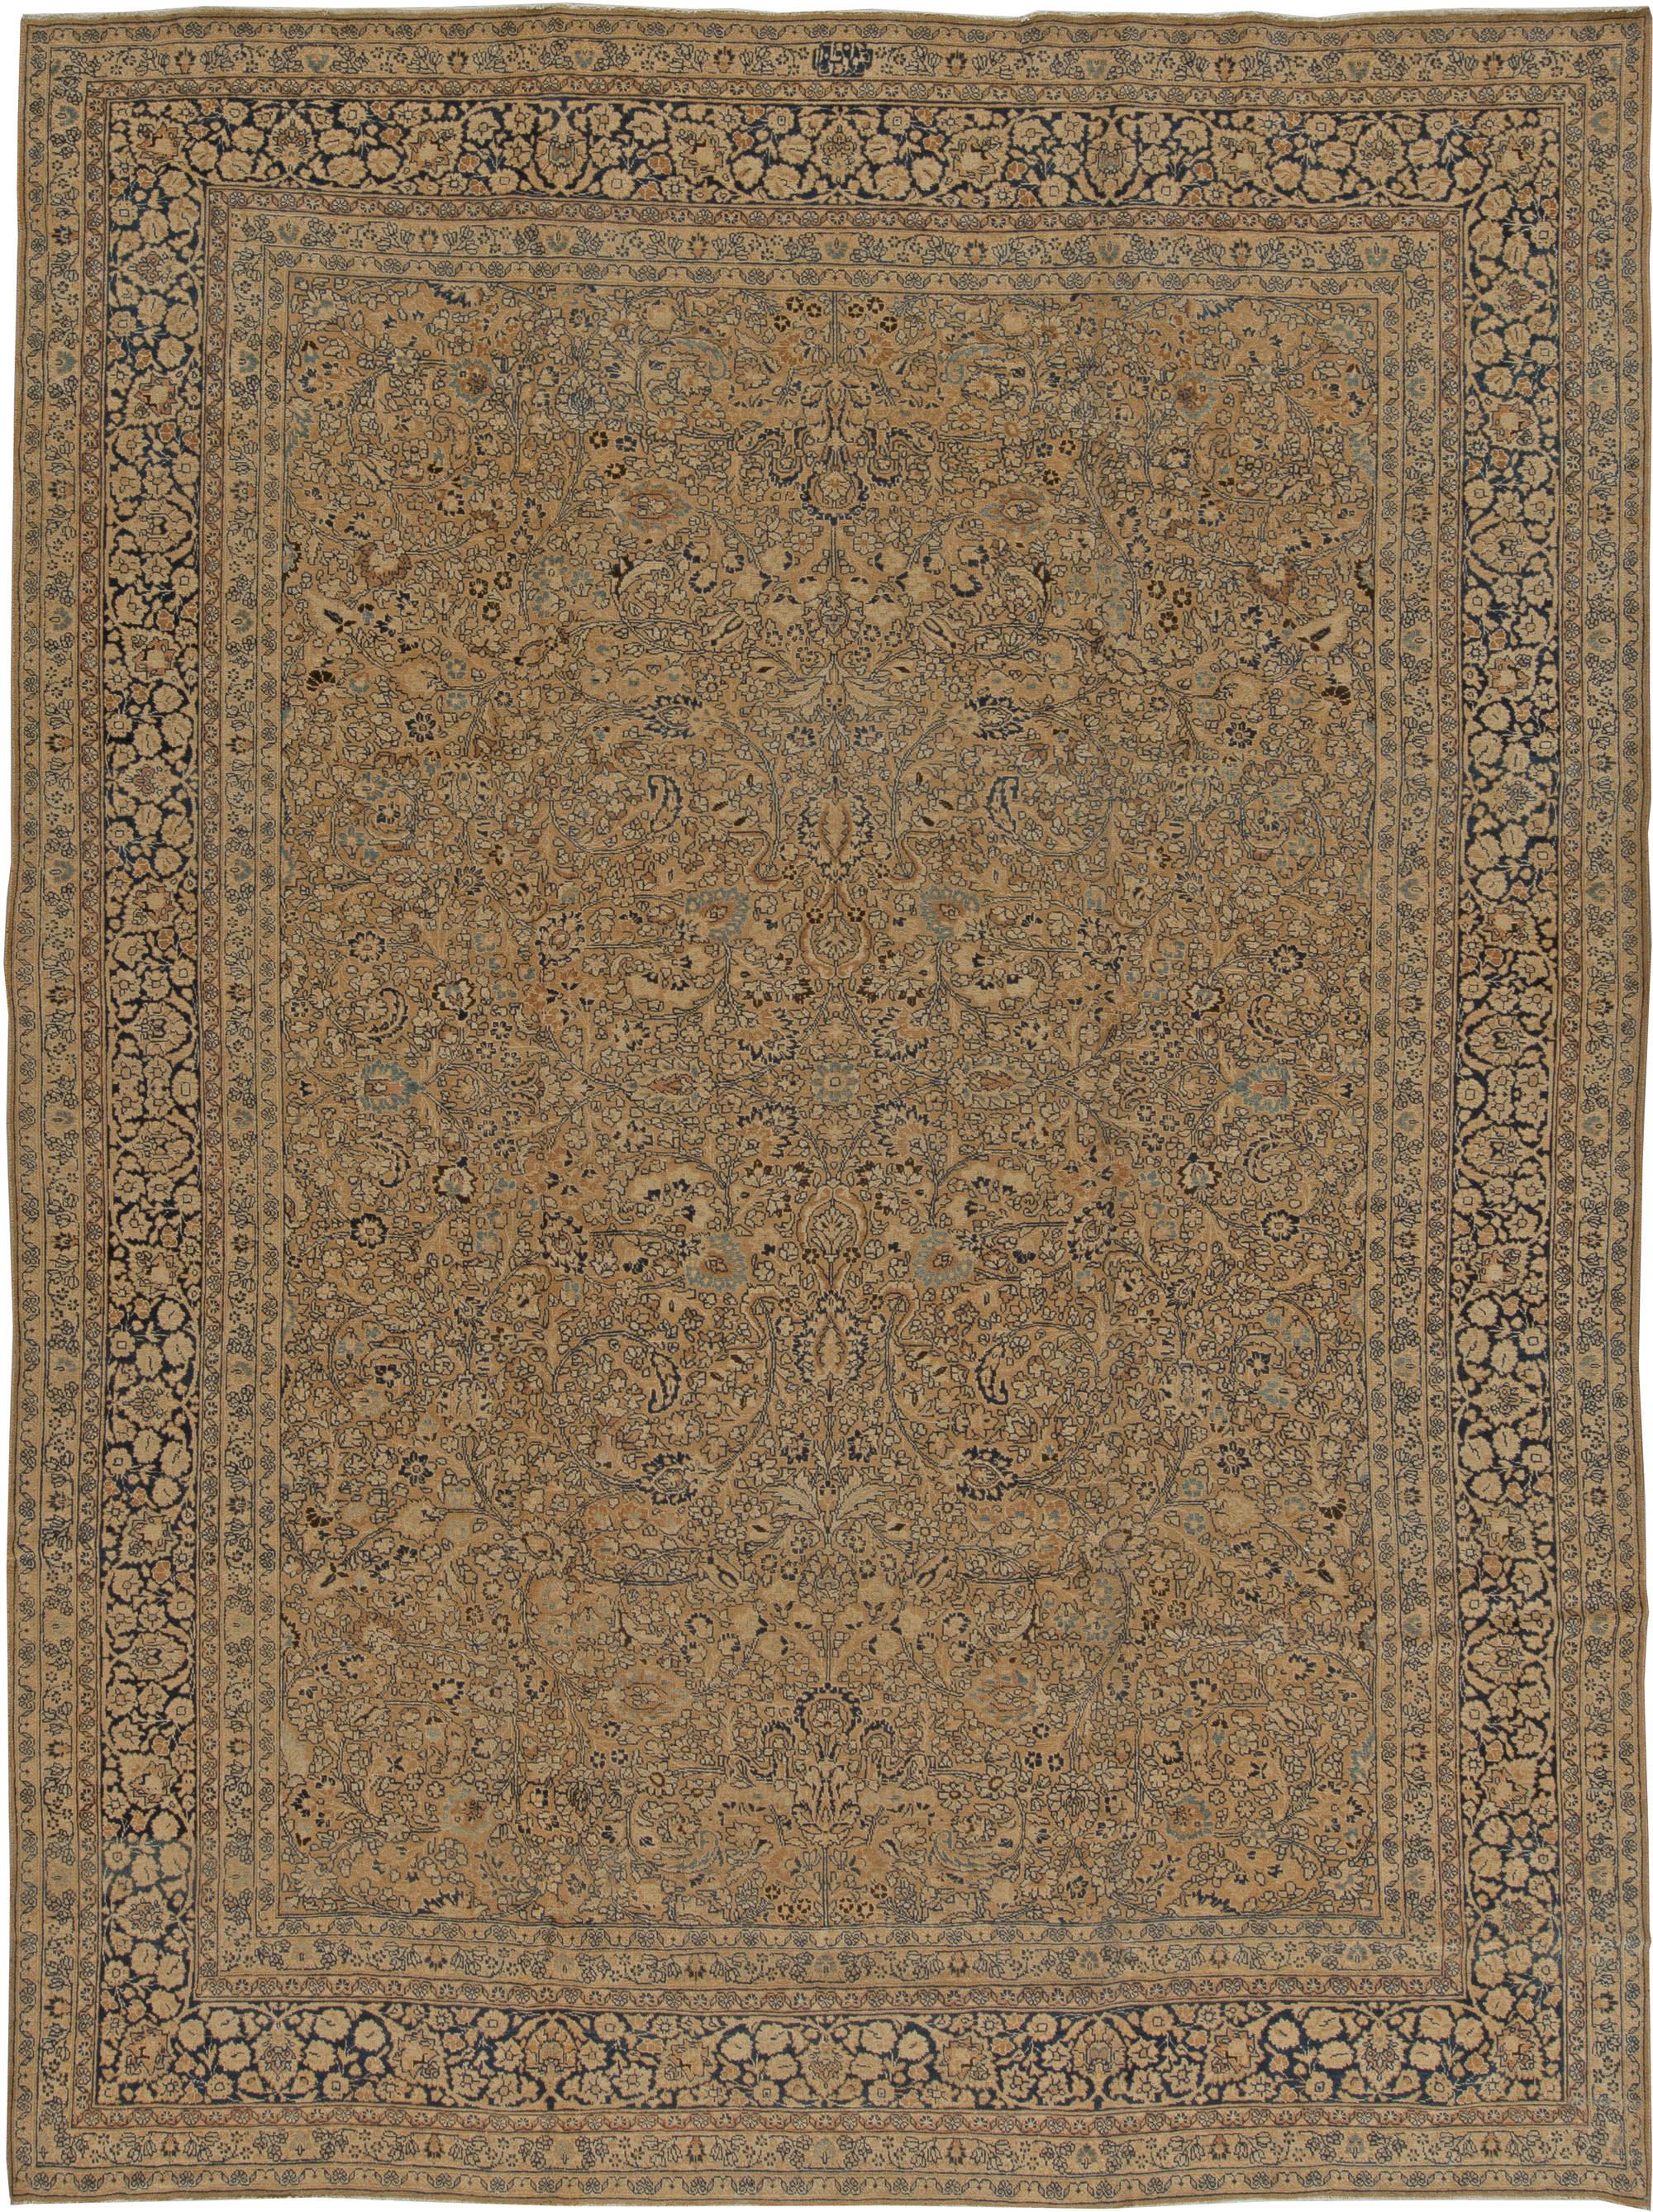 Antique Persian Khorassan Rug Bb5563 By Doris Leslie Blau